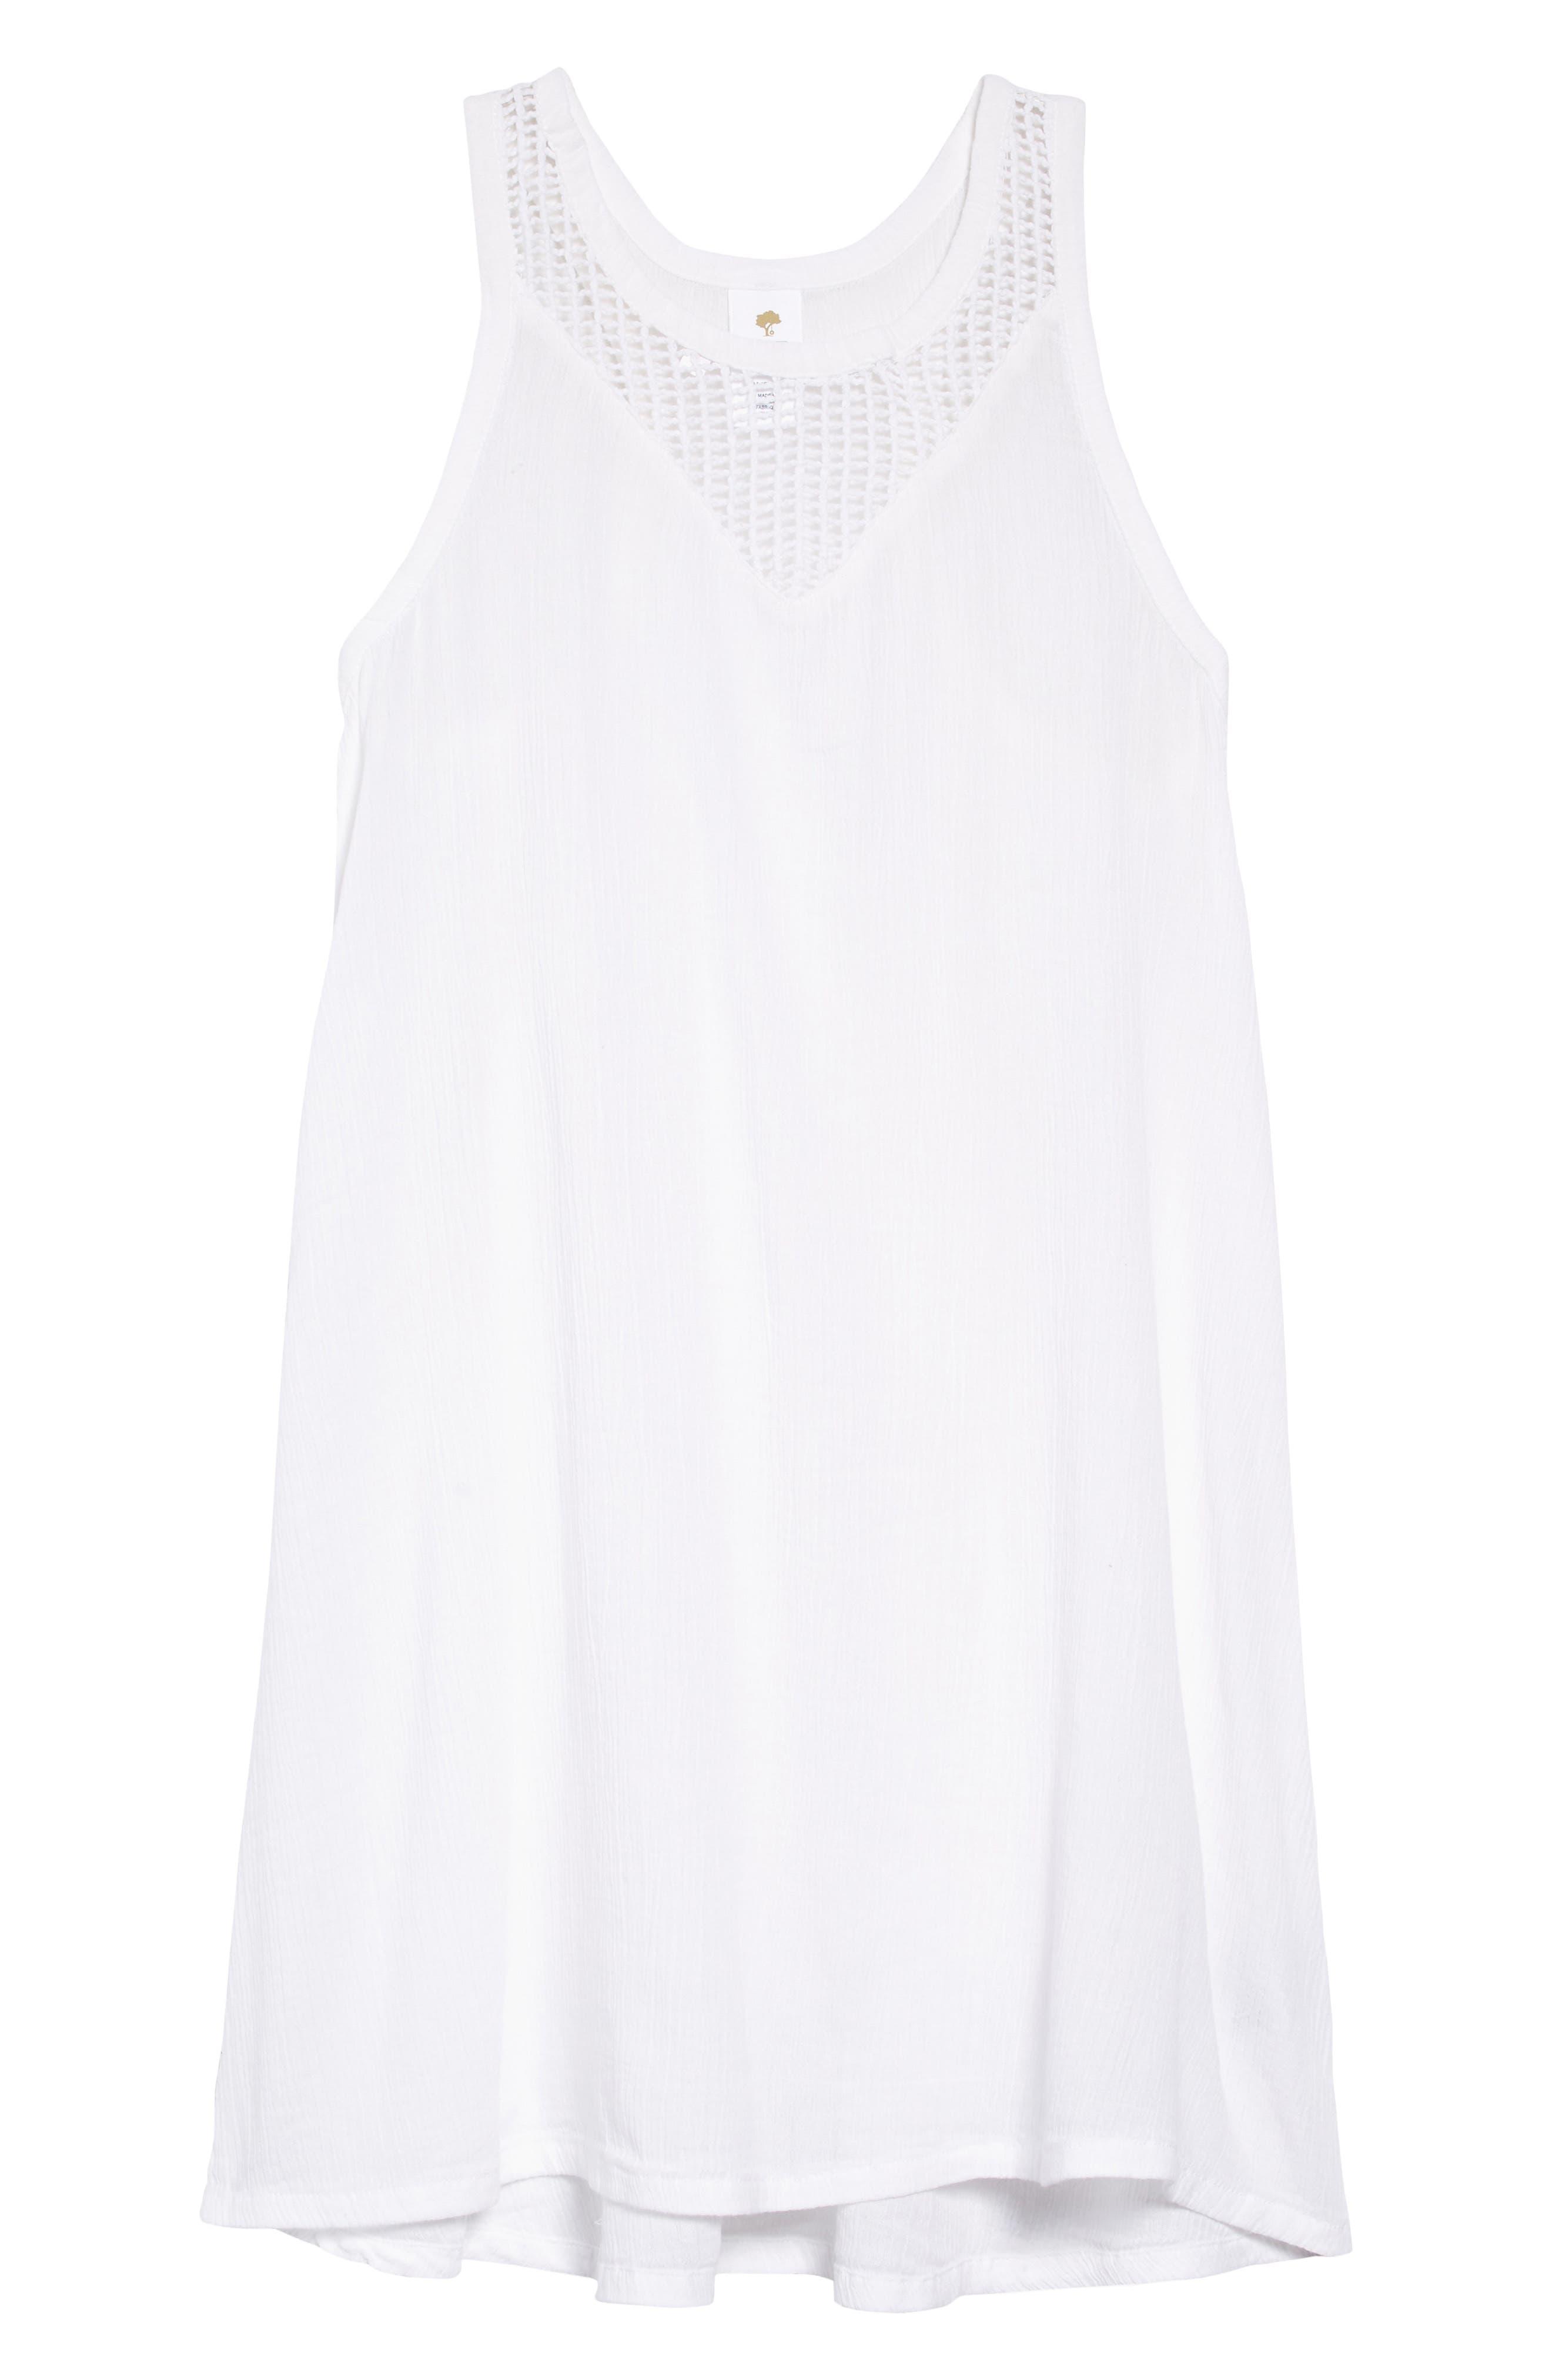 TUCKER + TATE, Cover-Up Dress, Main thumbnail 1, color, WHITE